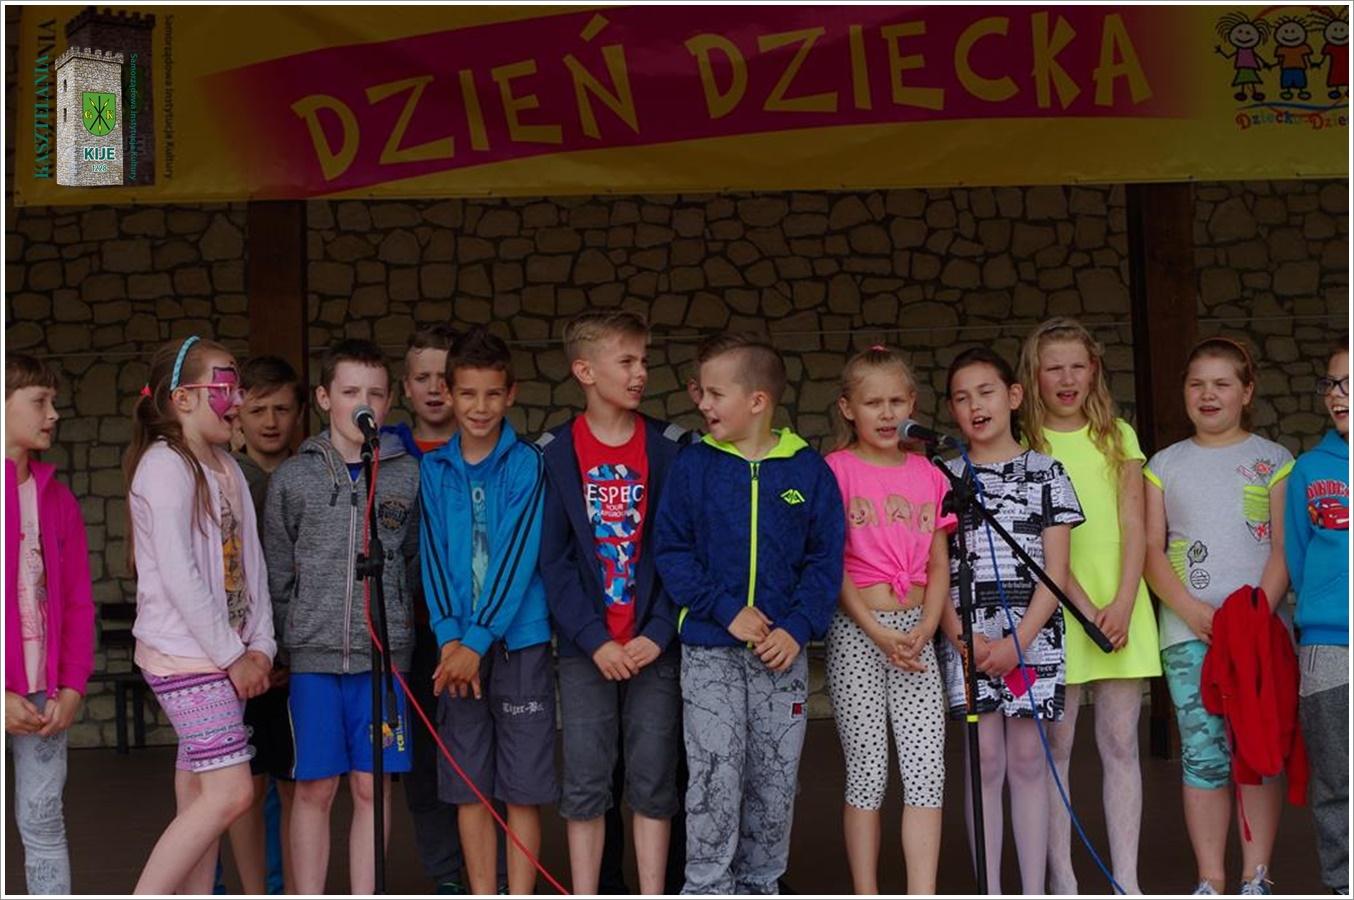 images/galleries/imprezy/2017/dzien_dziecka2017/IMGP0782 (Copy)